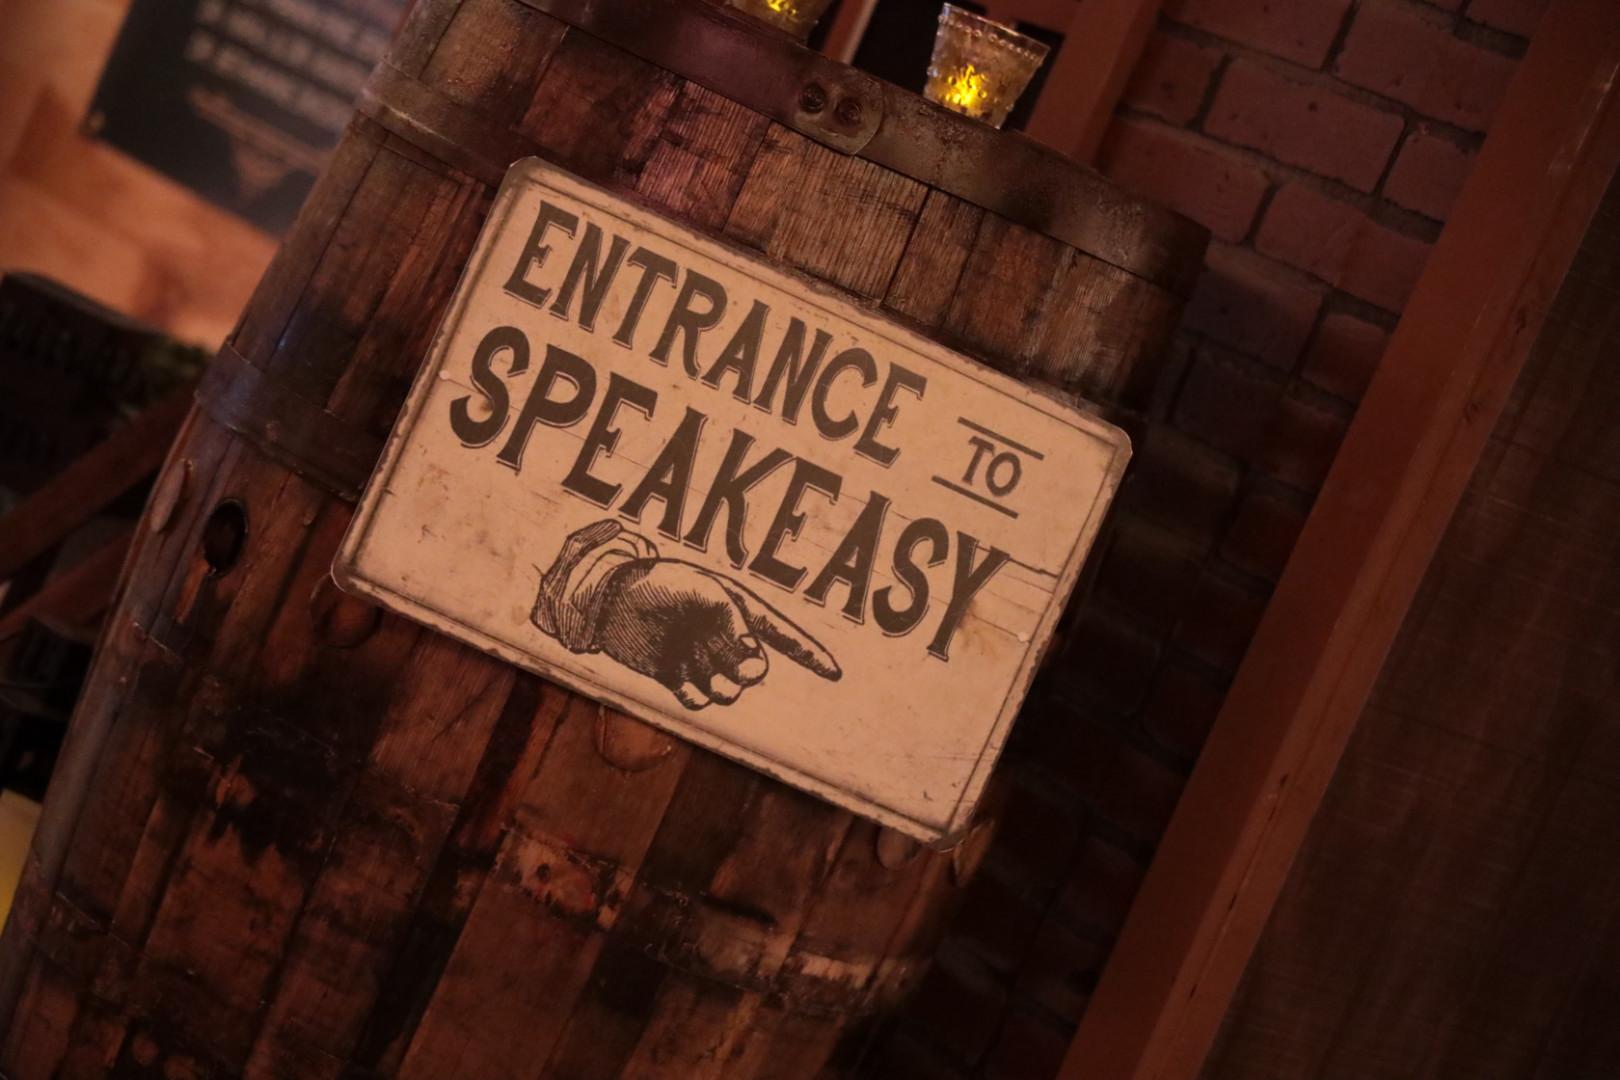 Entrance to speakeasy sign on a wooden bourbon barrel